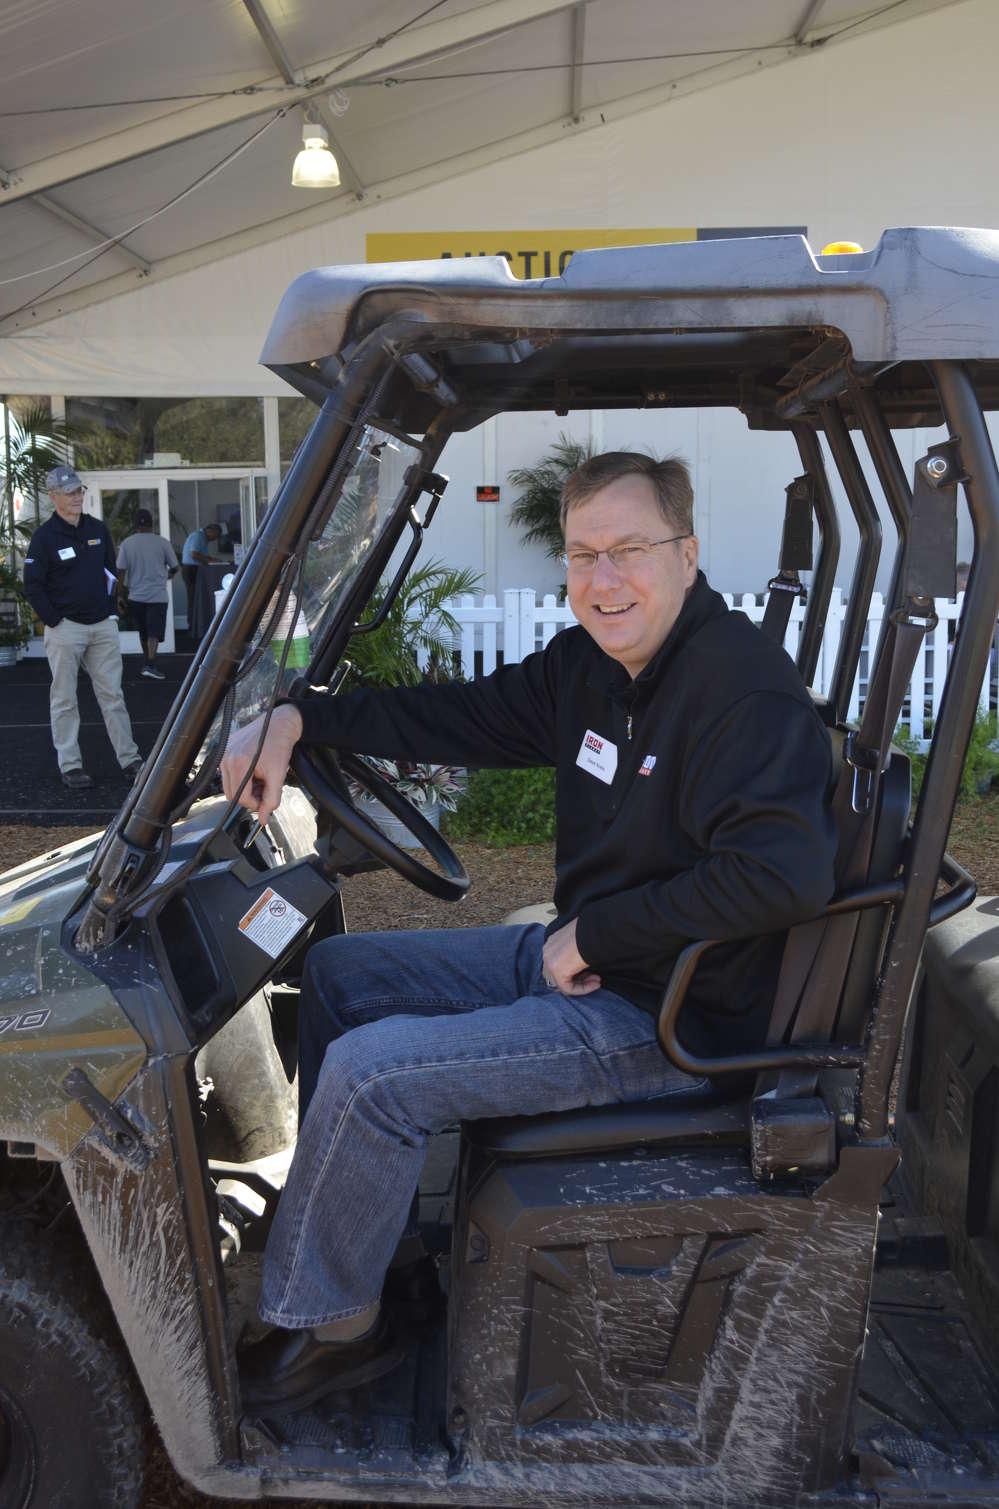 Dave Kreis of IronPlanet shuttles prospective buyers across the sale site.